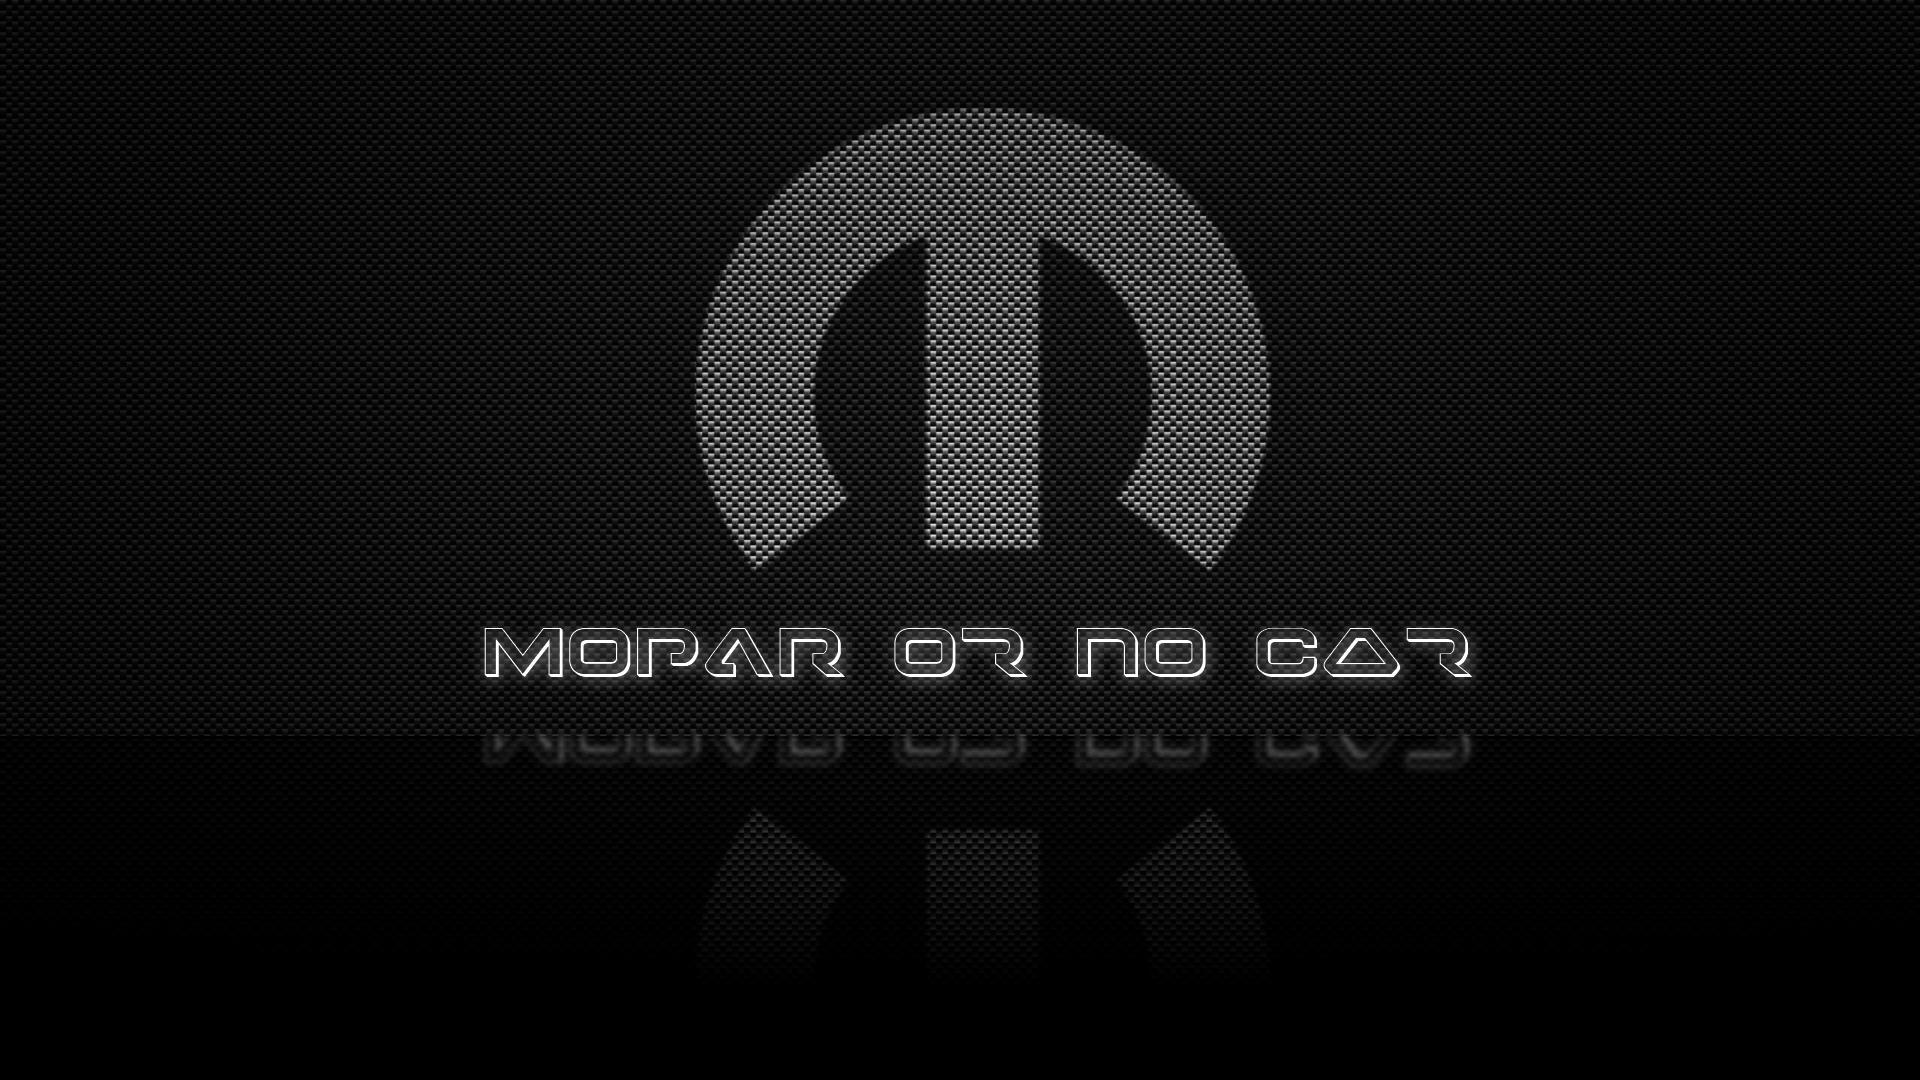 Mopar wallpaper   331508 1920x1080